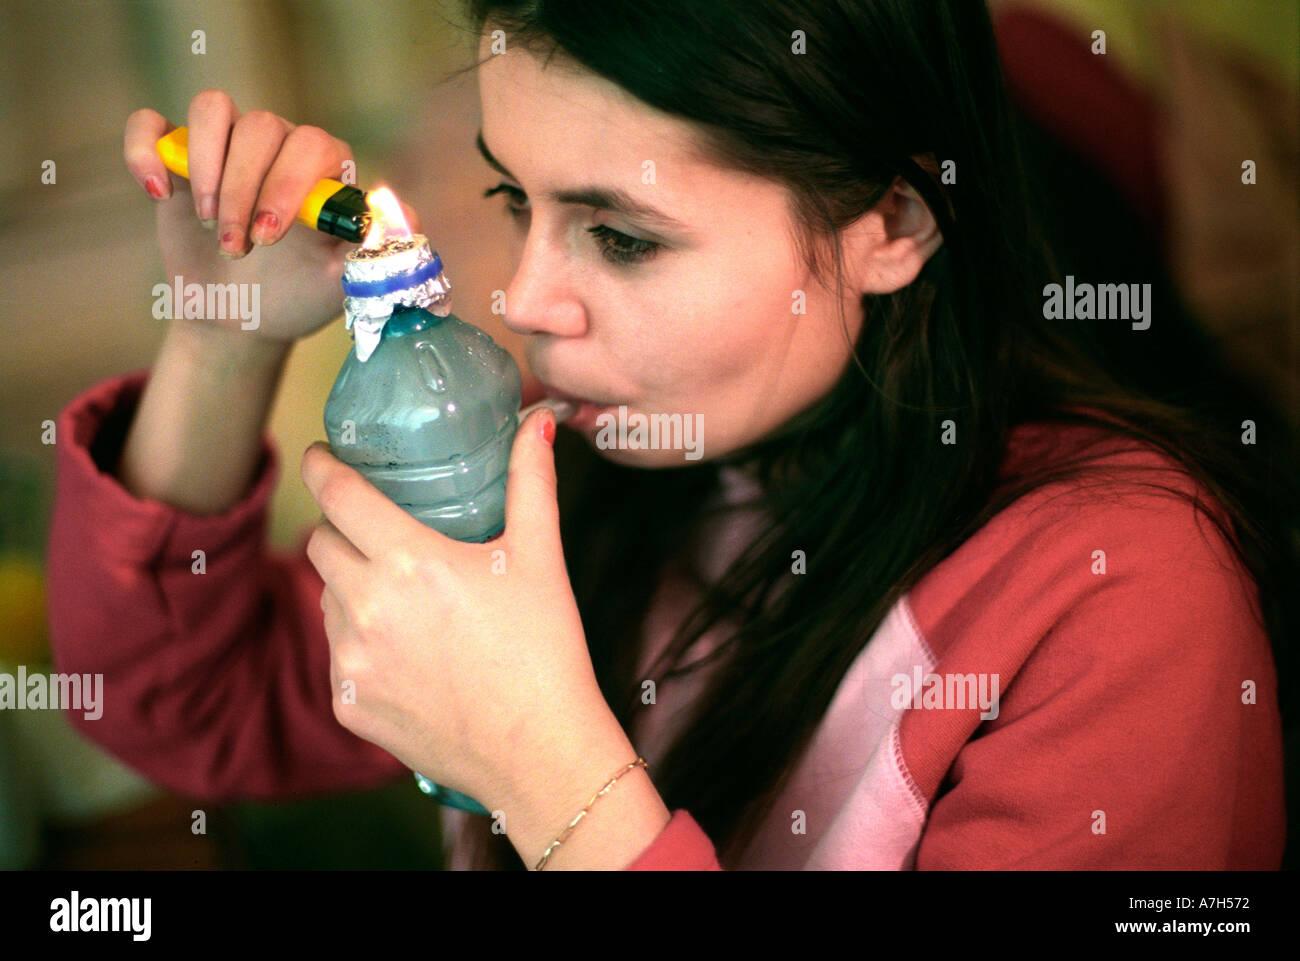 A image of necket black girls cooking crack